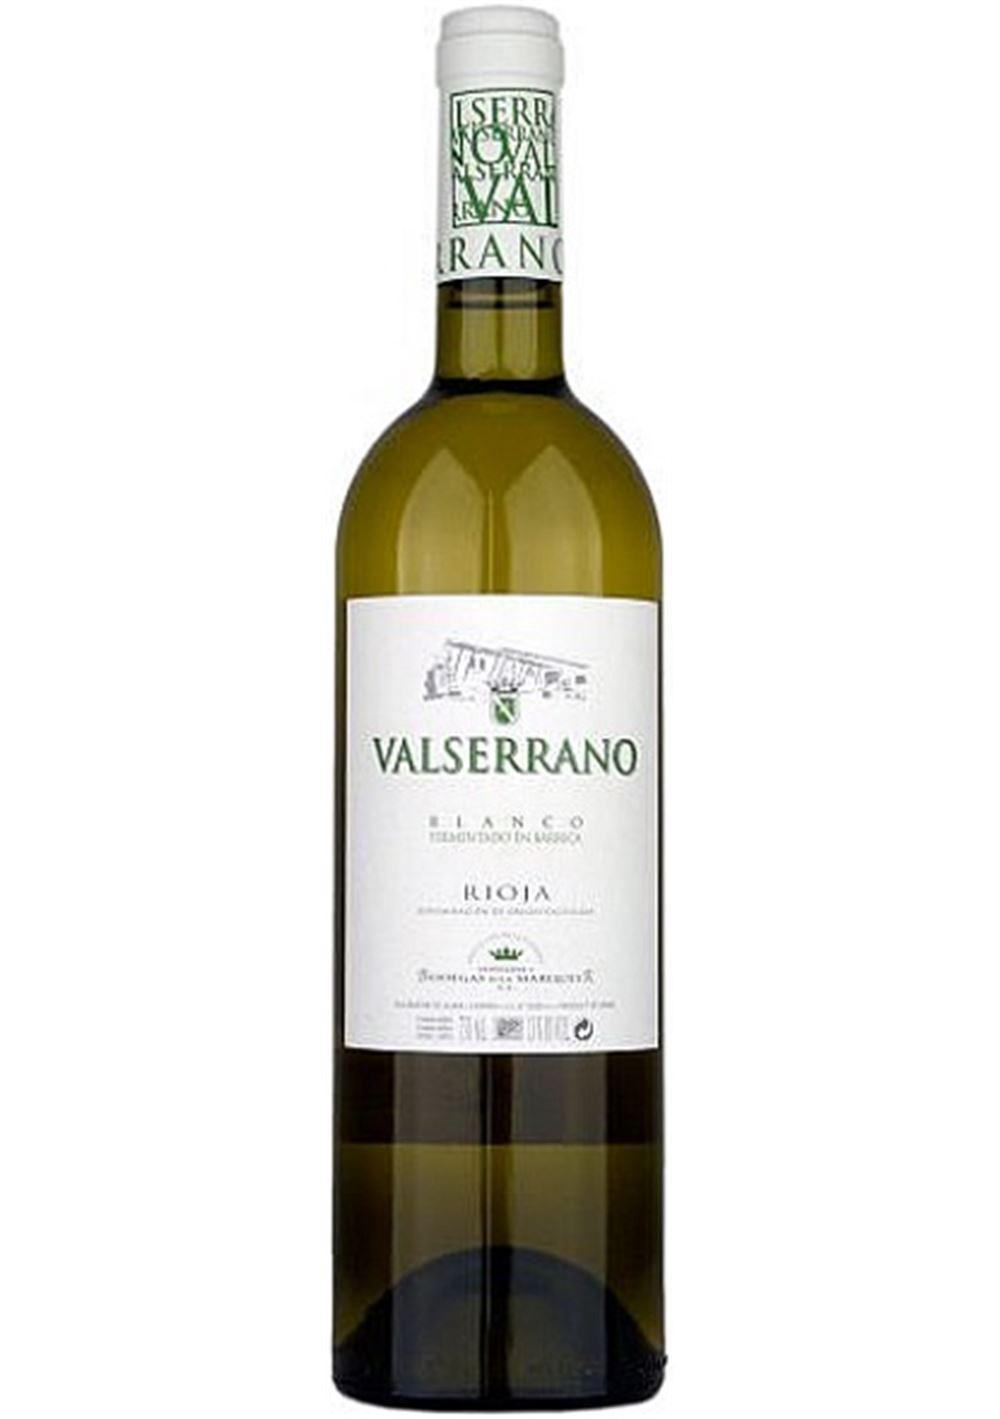 VALSERRANO-BLANCO-BARRICA